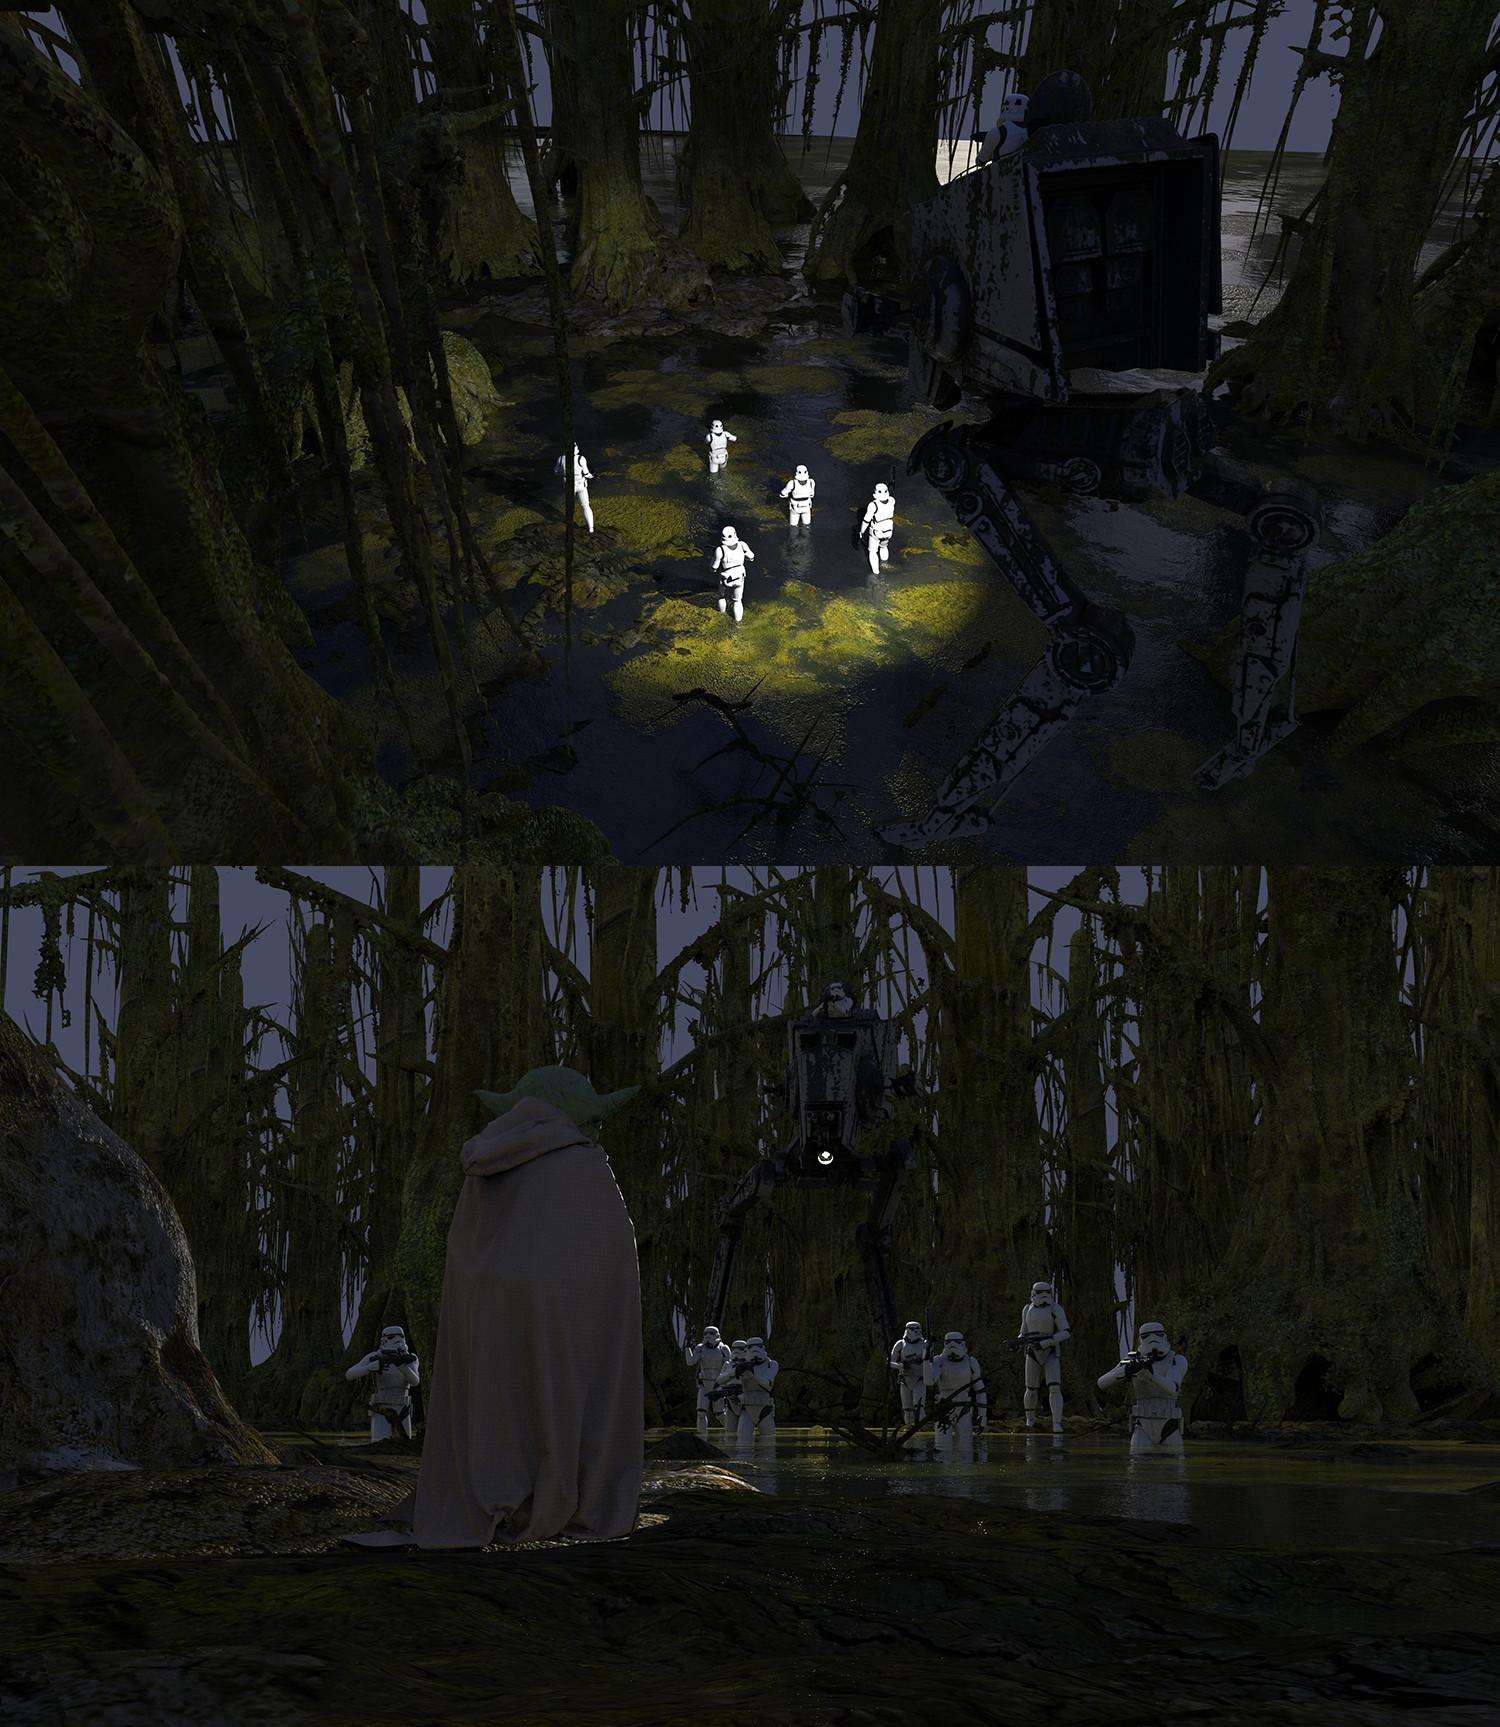 Oleg zherebin renders